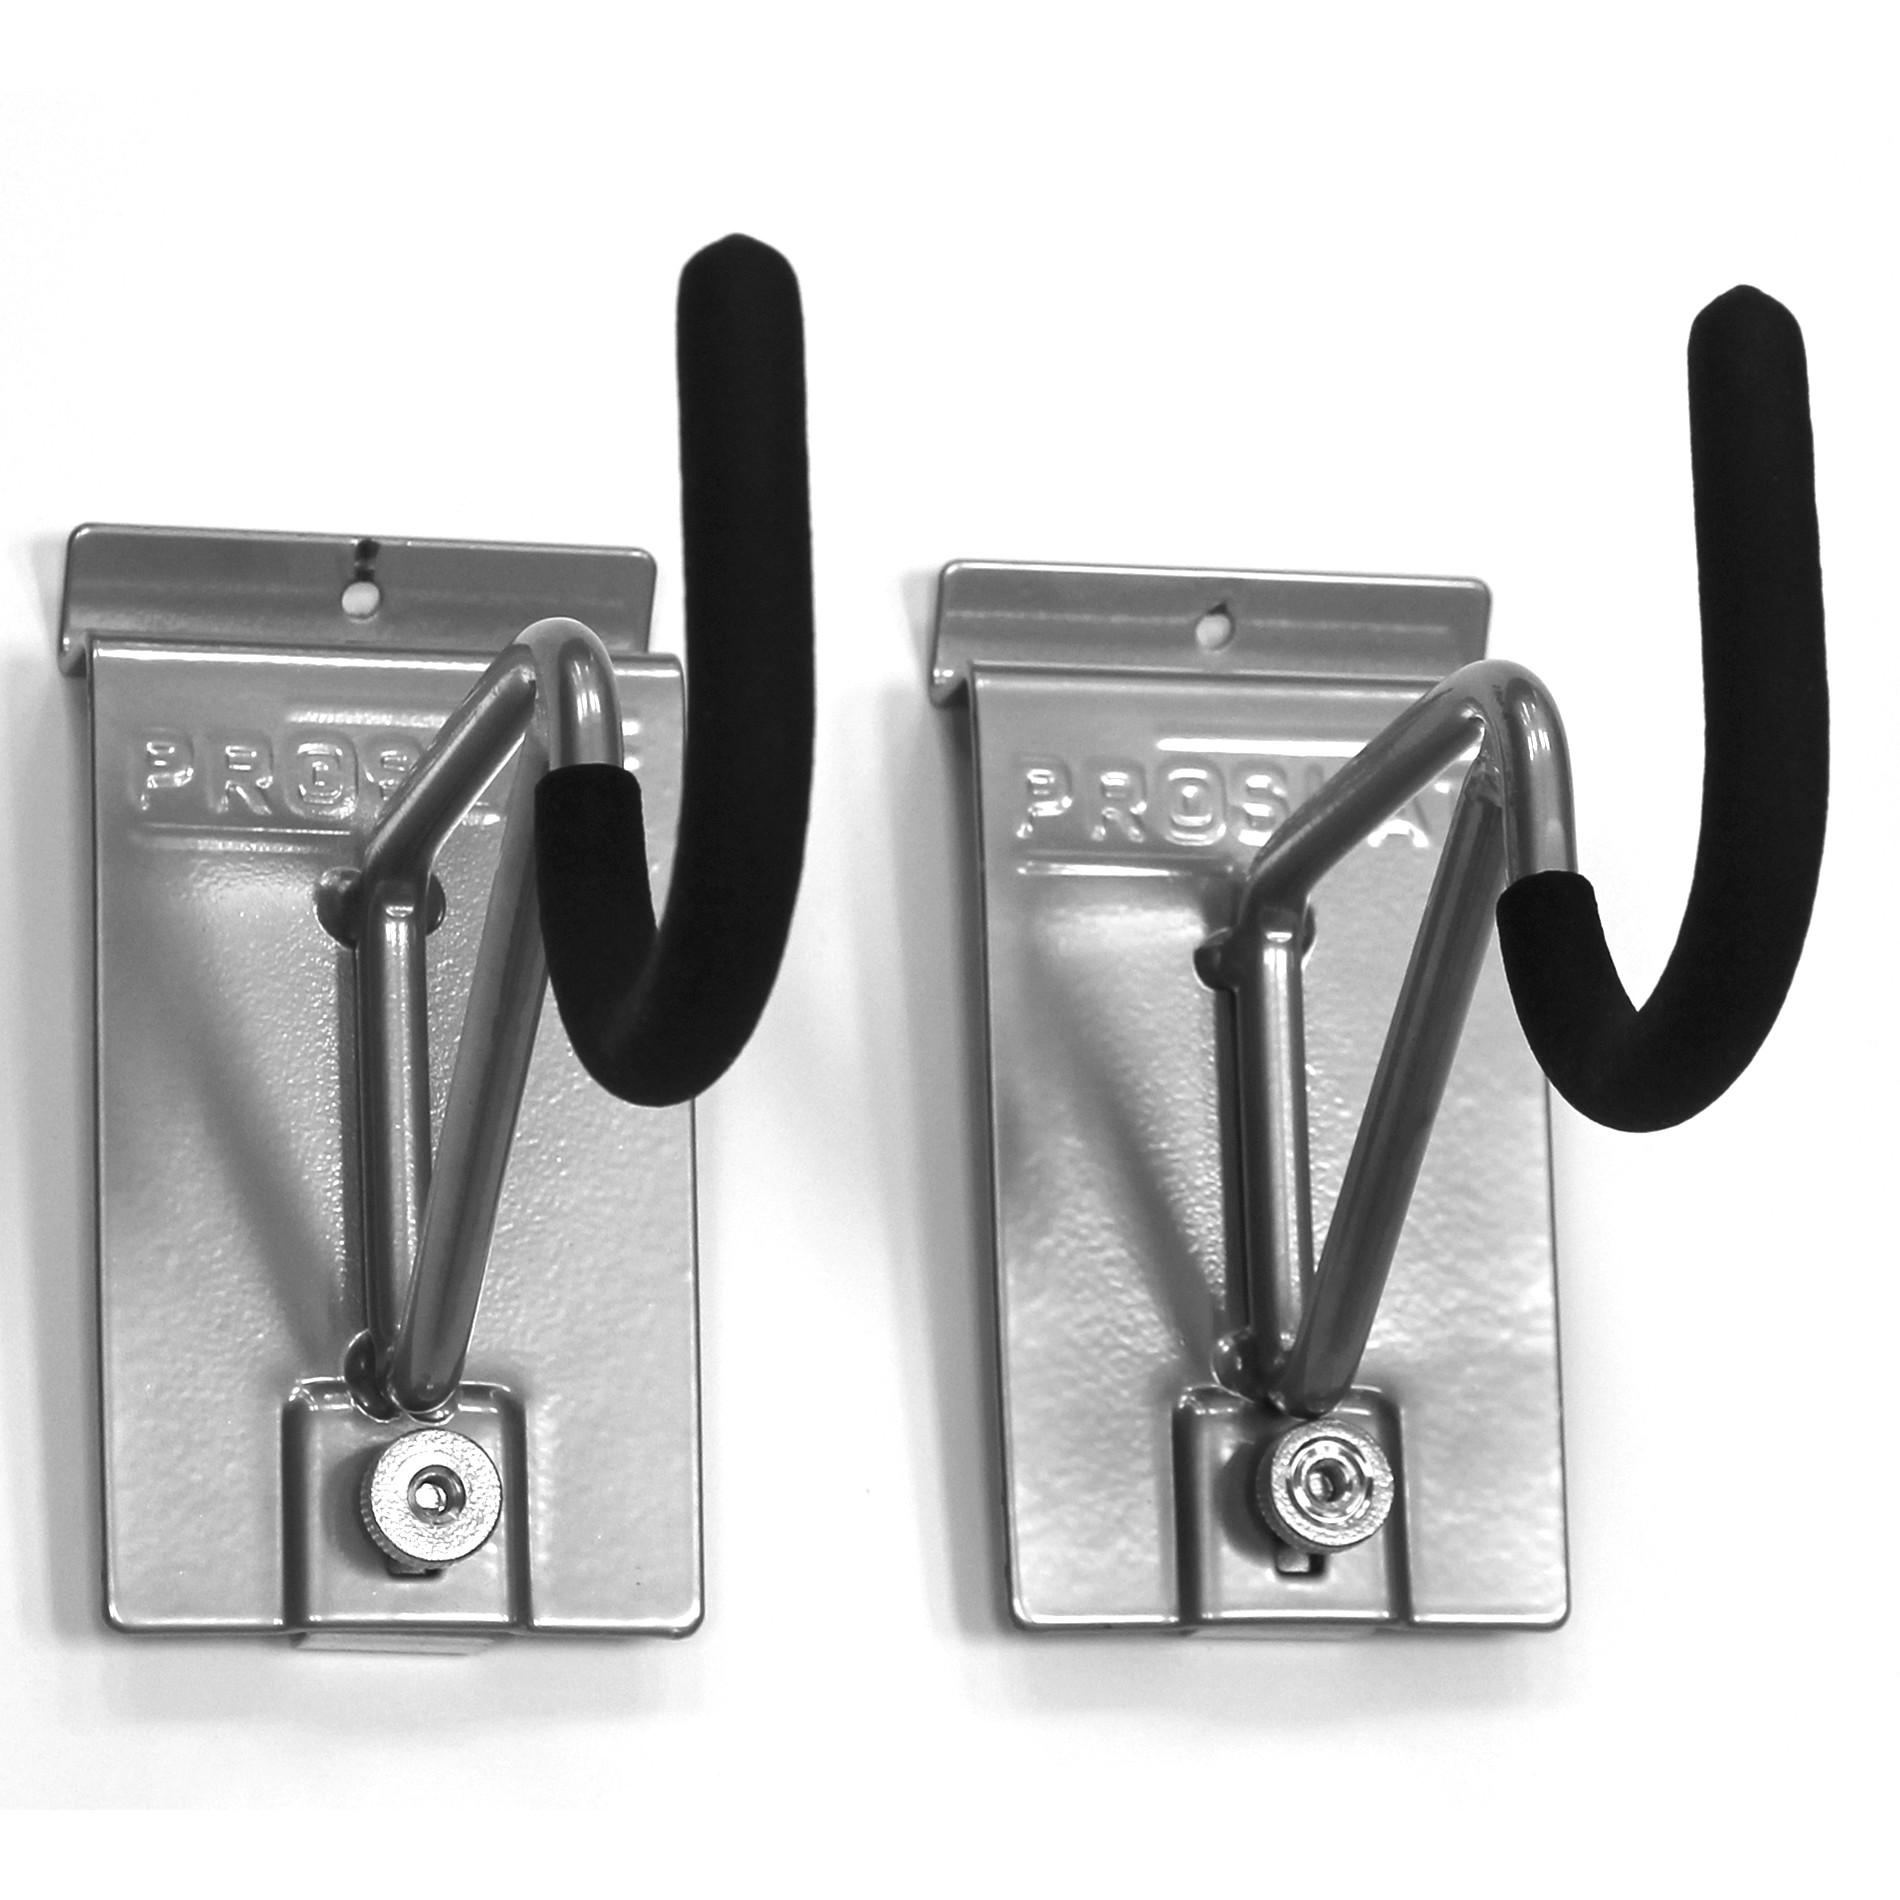 Slatwall Hooks | Storwall | Vertical Slatwall Panels